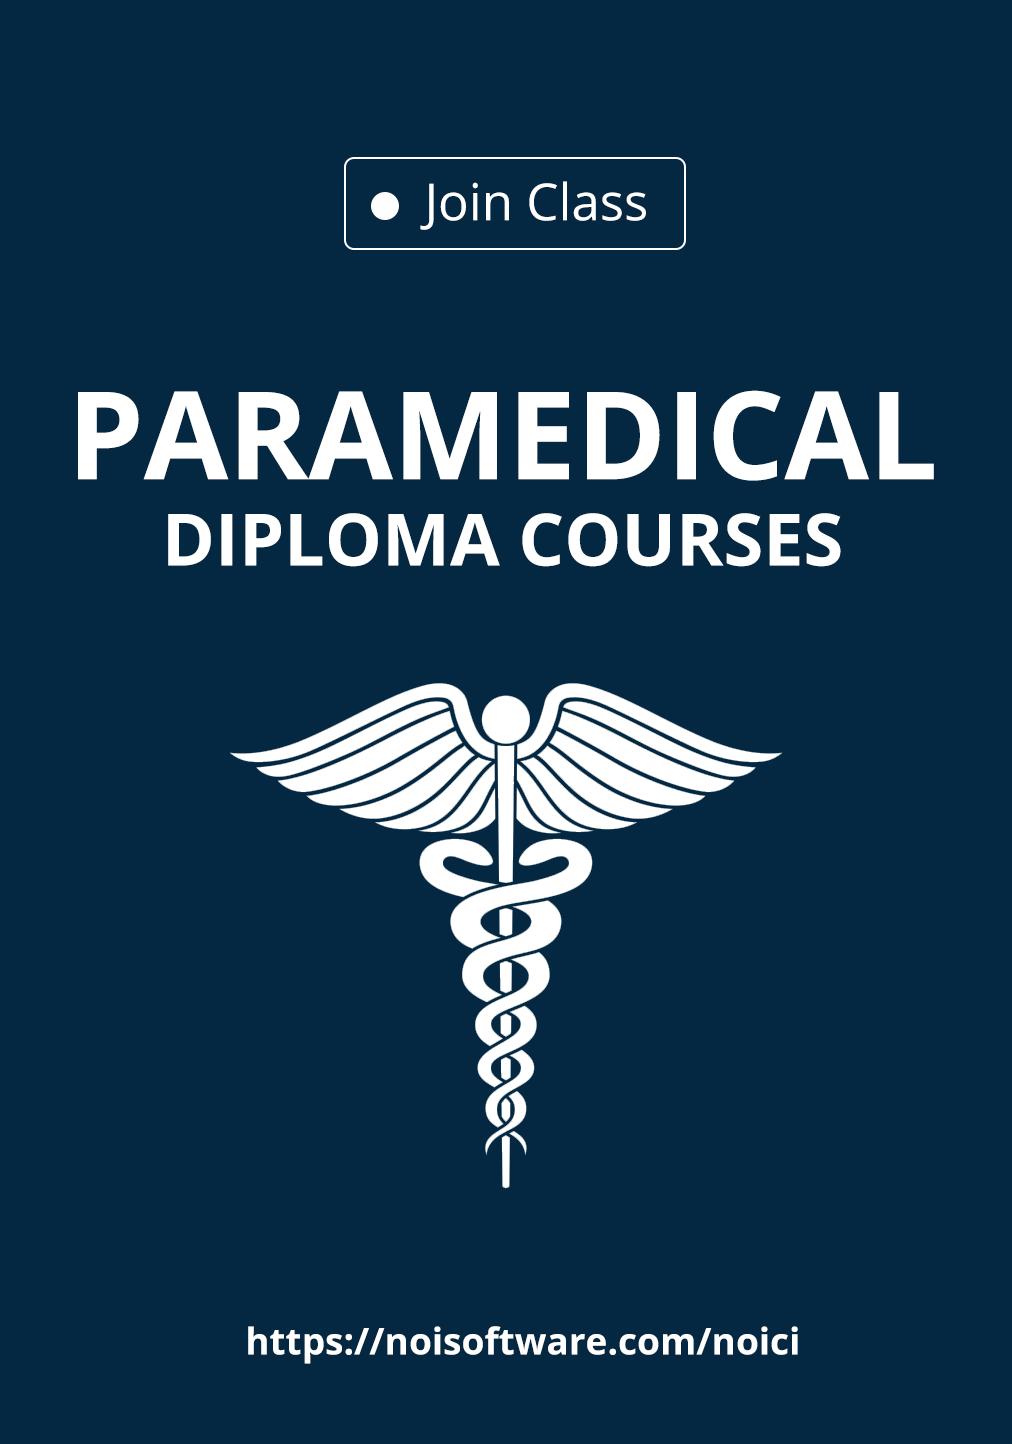 Paramedical Diploma Course